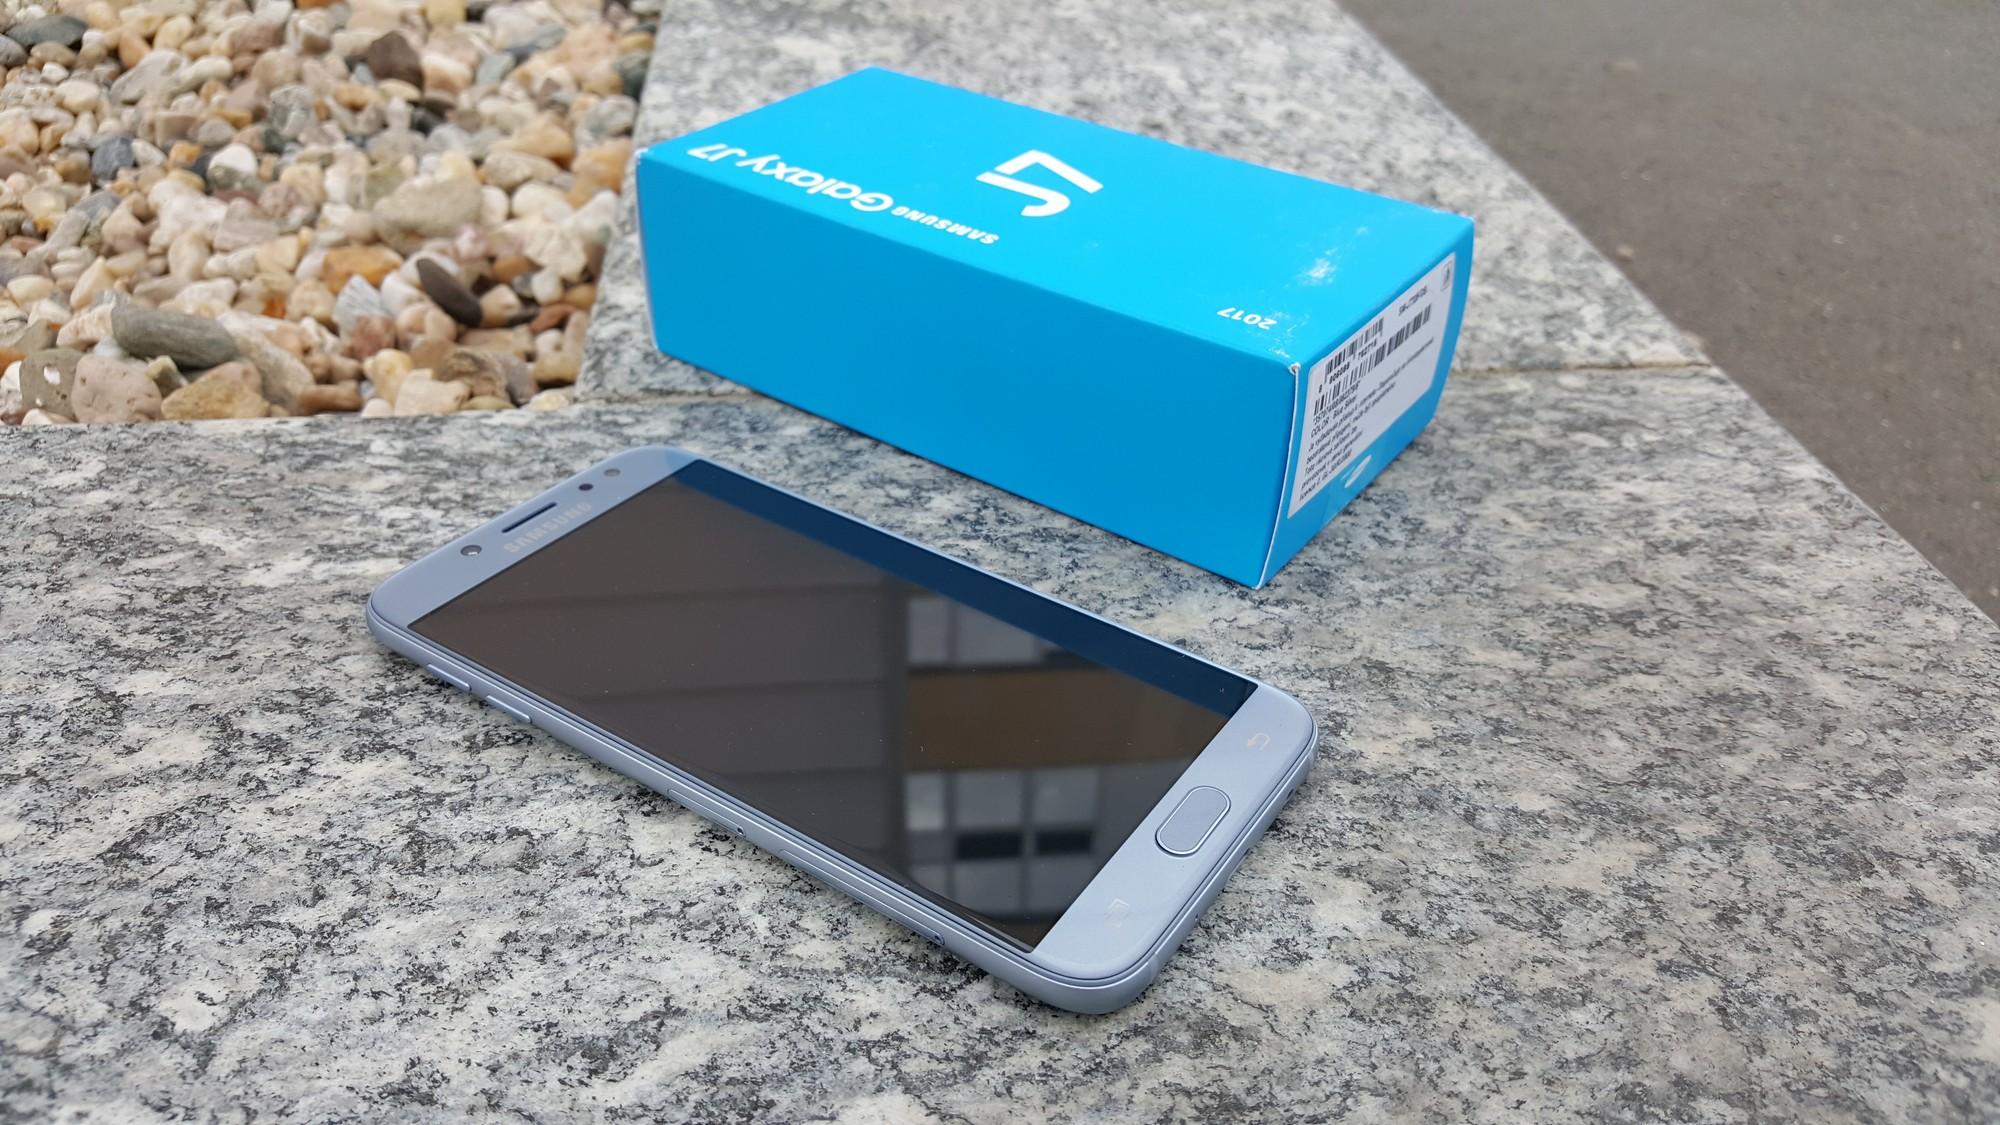 Mobiln telefon Samsung Galaxy J7